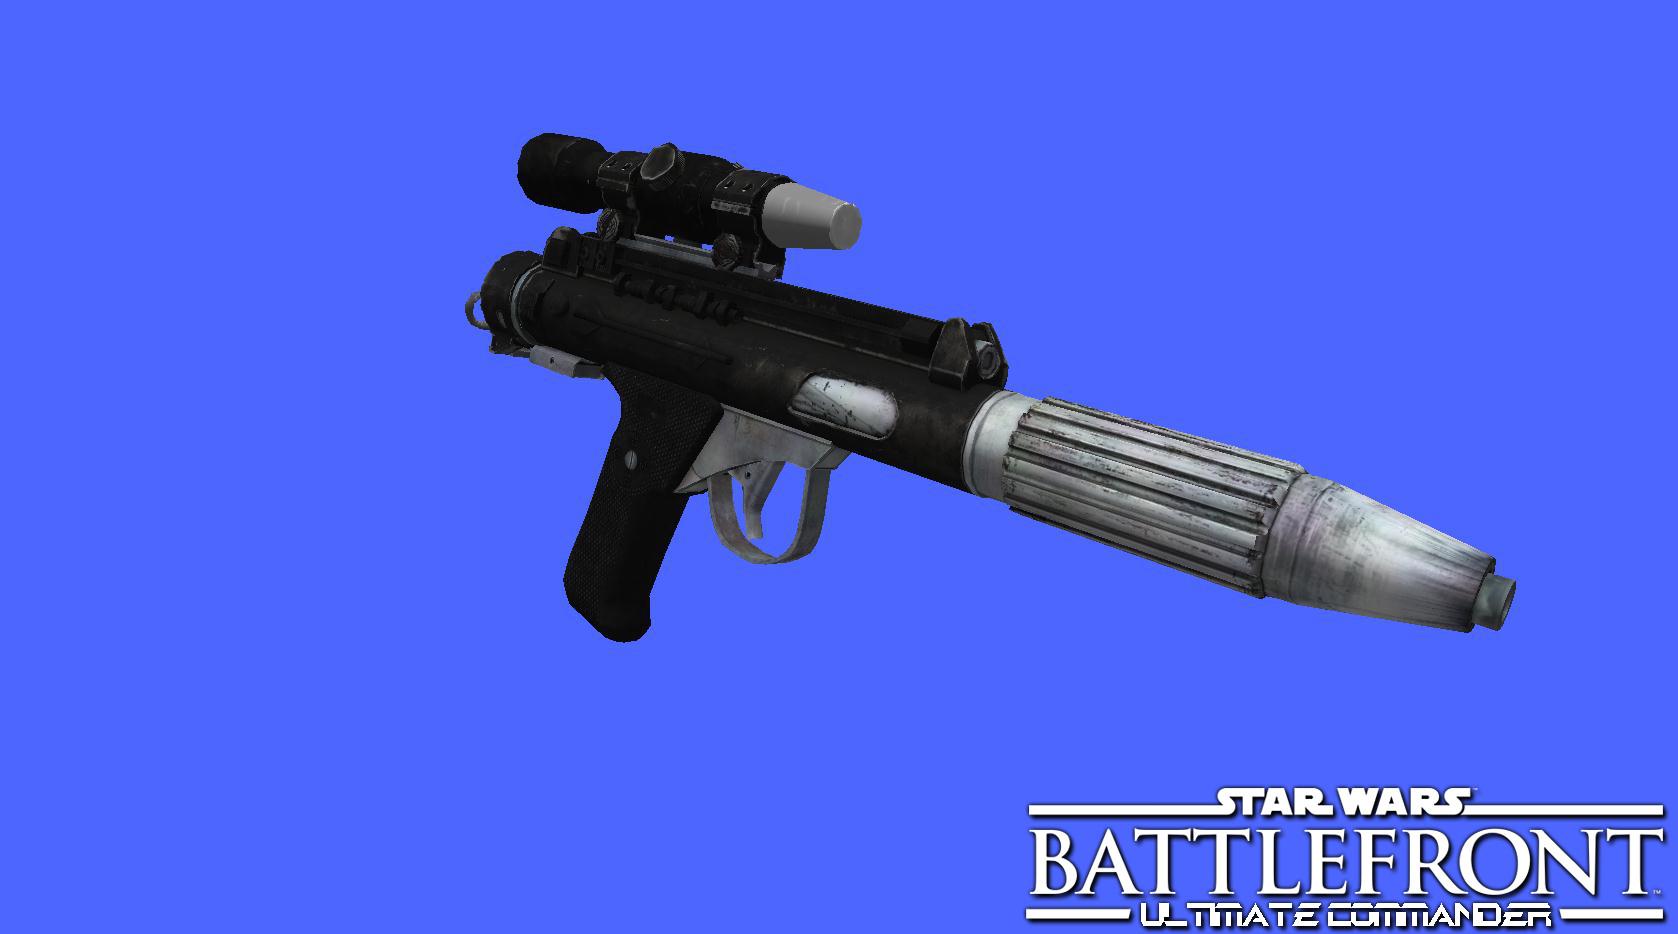 DICE DH 17 blaster pistol 1